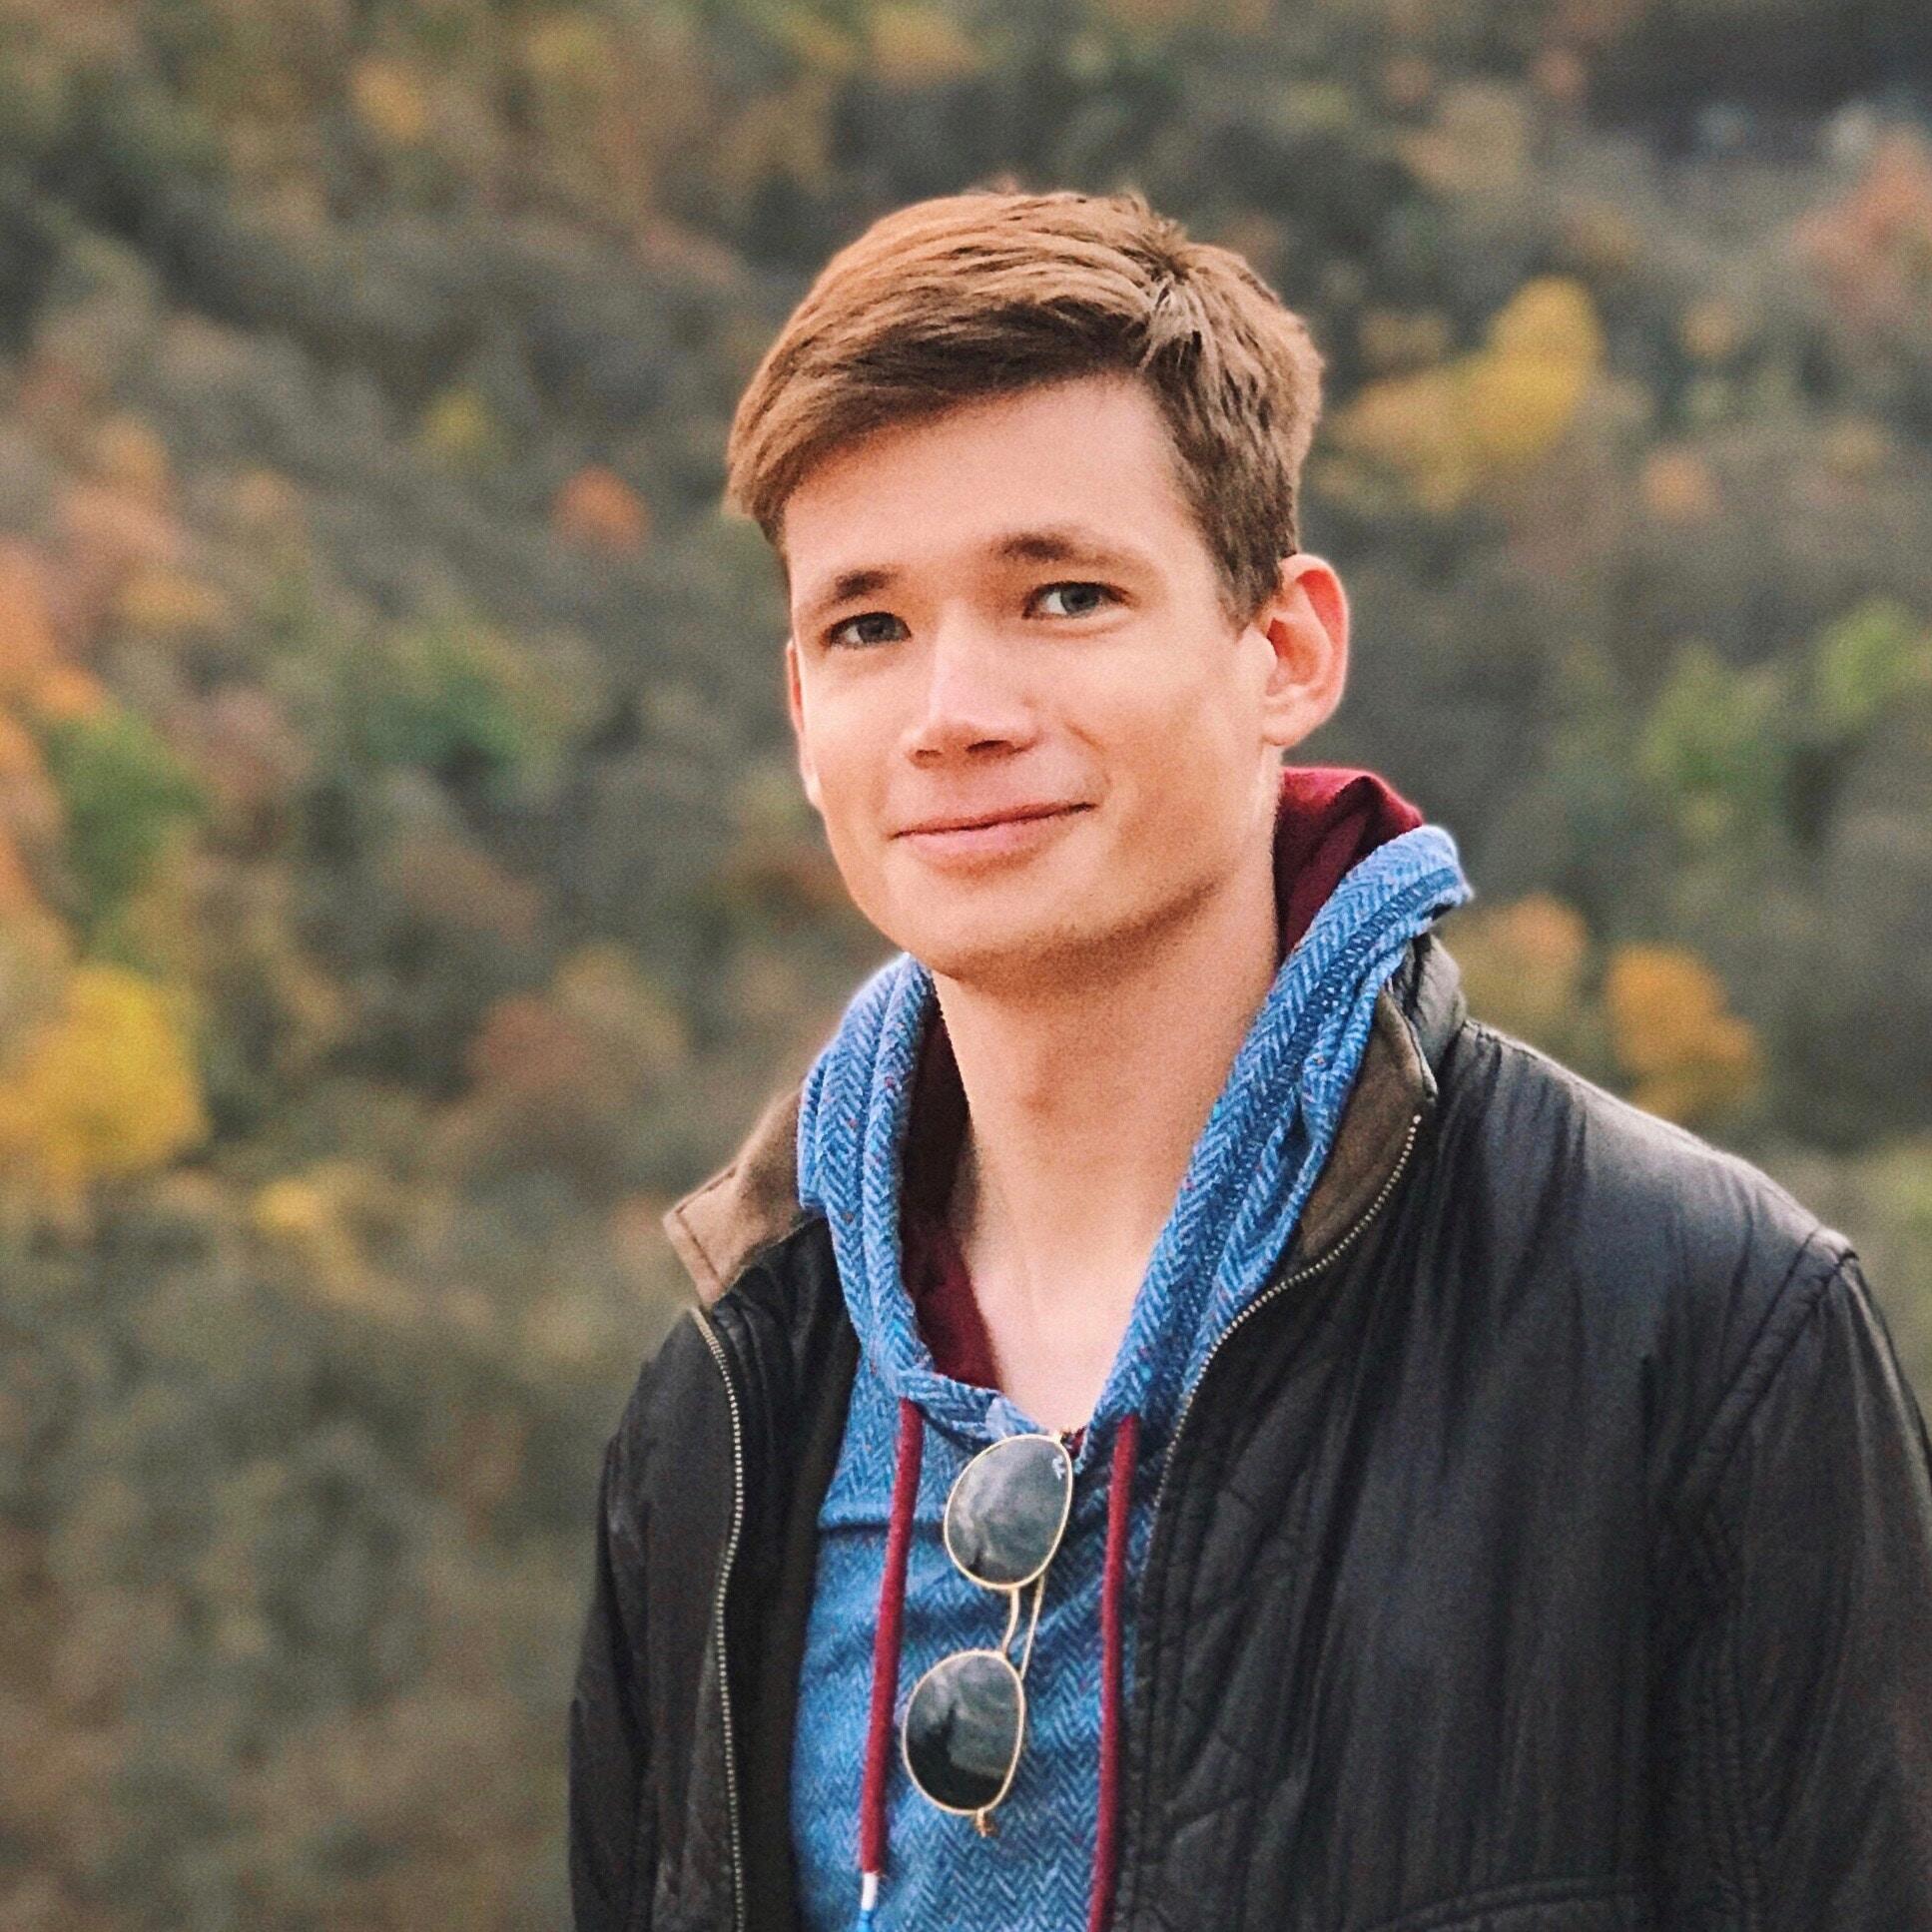 Go to Daniel Novykov's profile